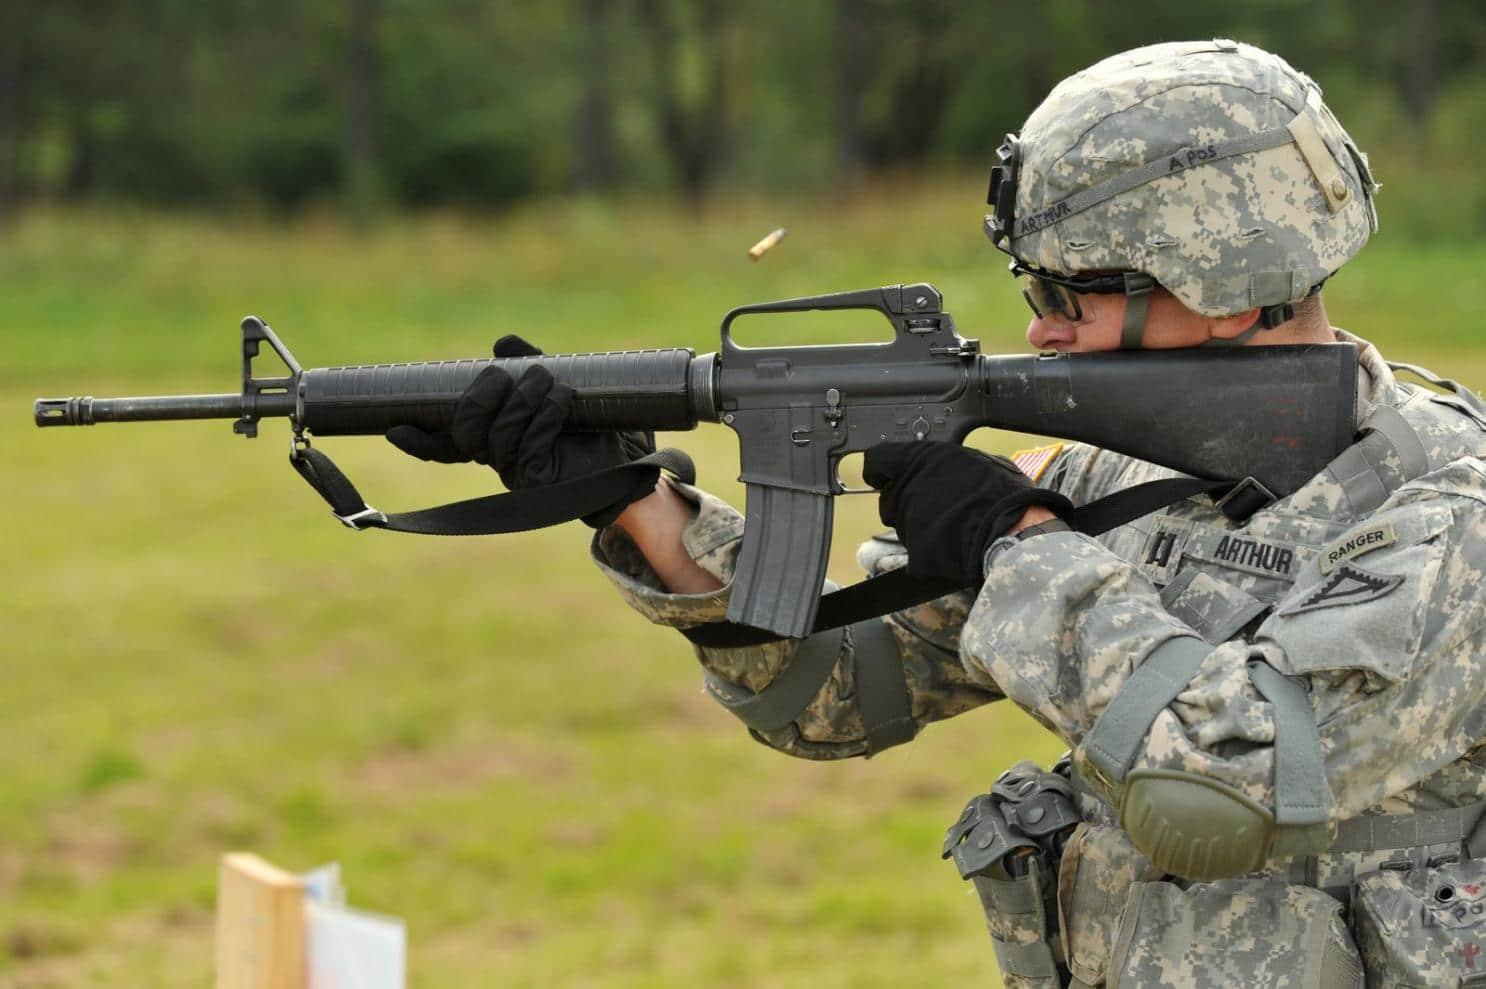 The M-16 Assault Rifle: The Gun Born in North Korea